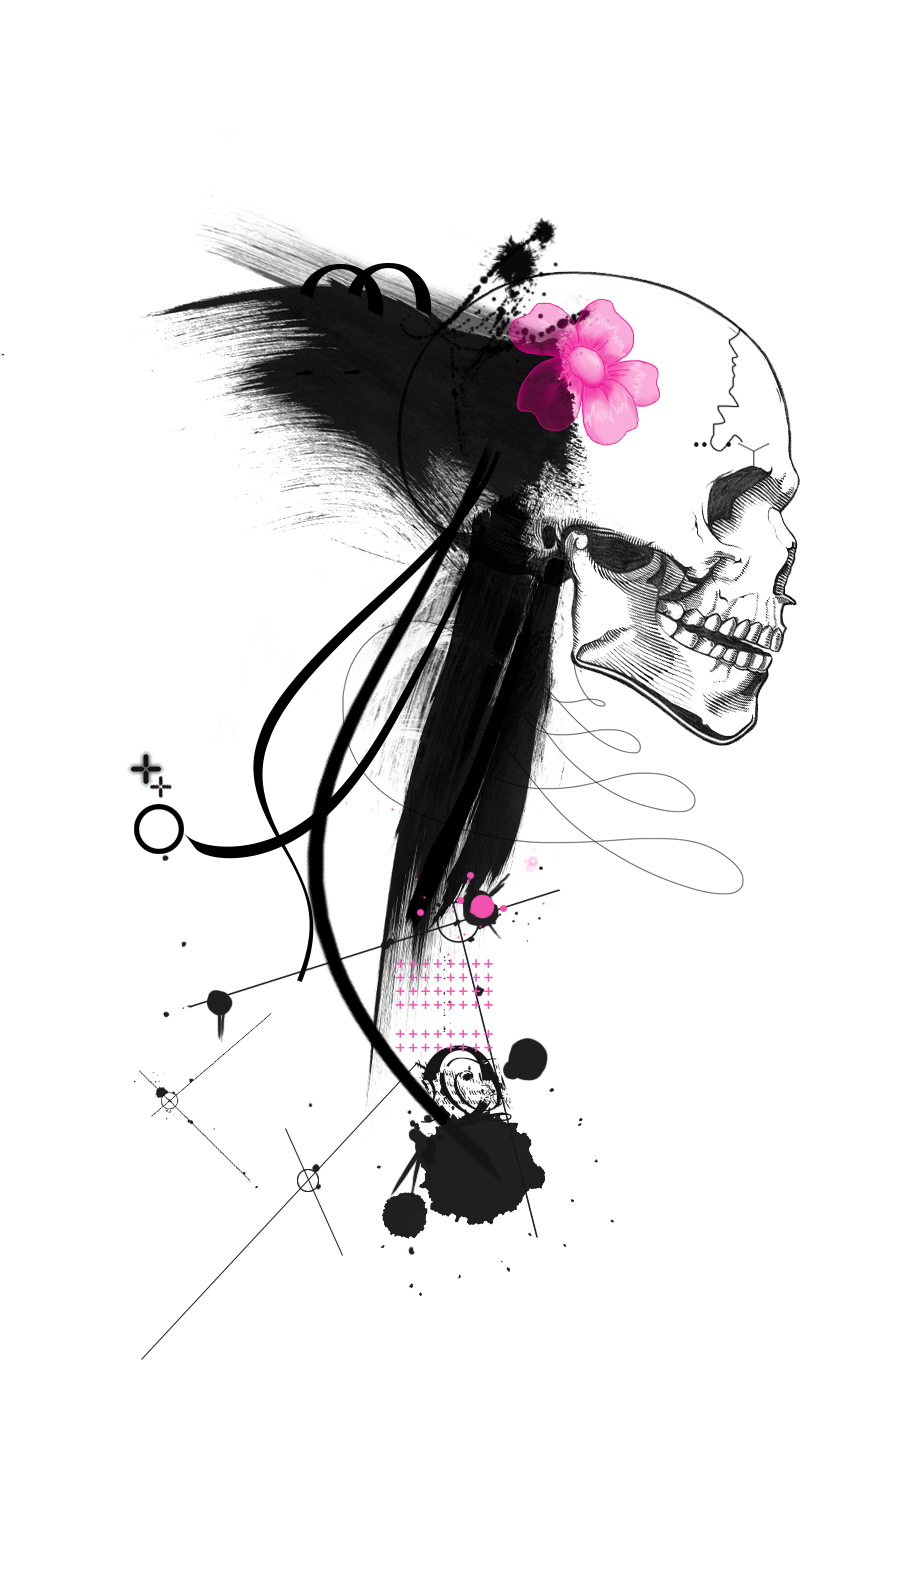 Flower Skull Trash Polka tattoo idea